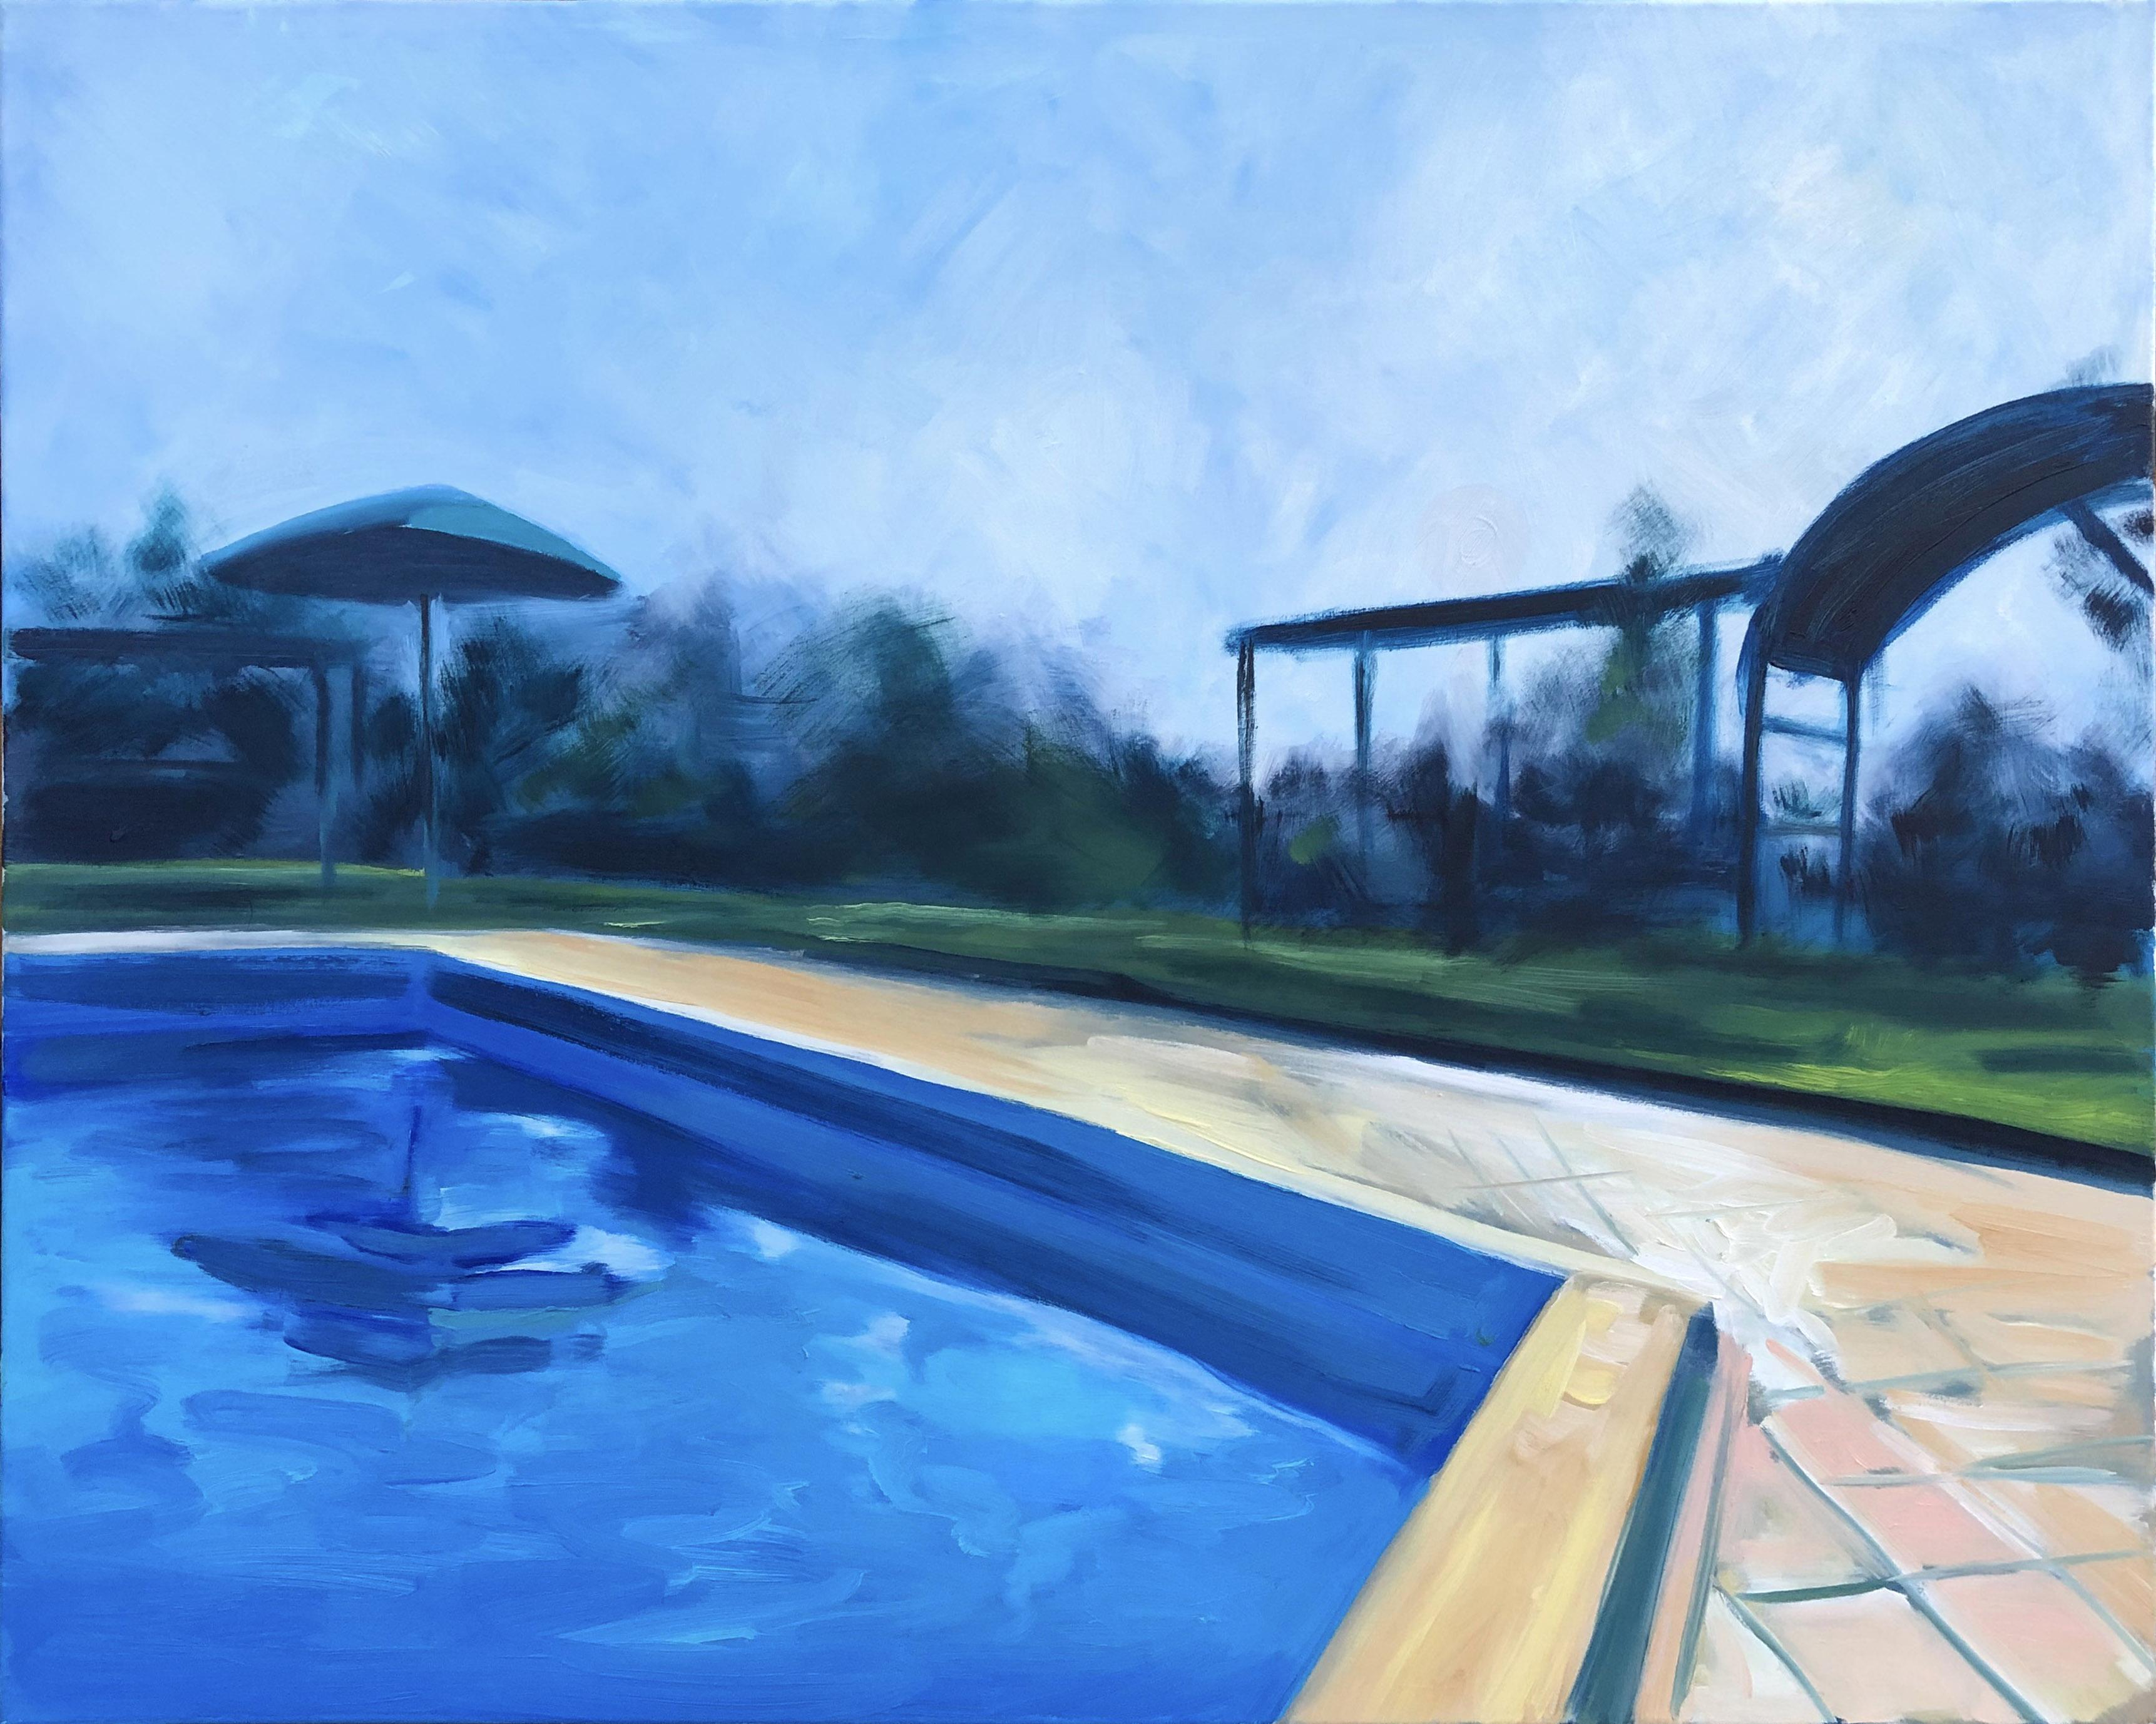 La piscina a Casa al Bosco, 2015 r.